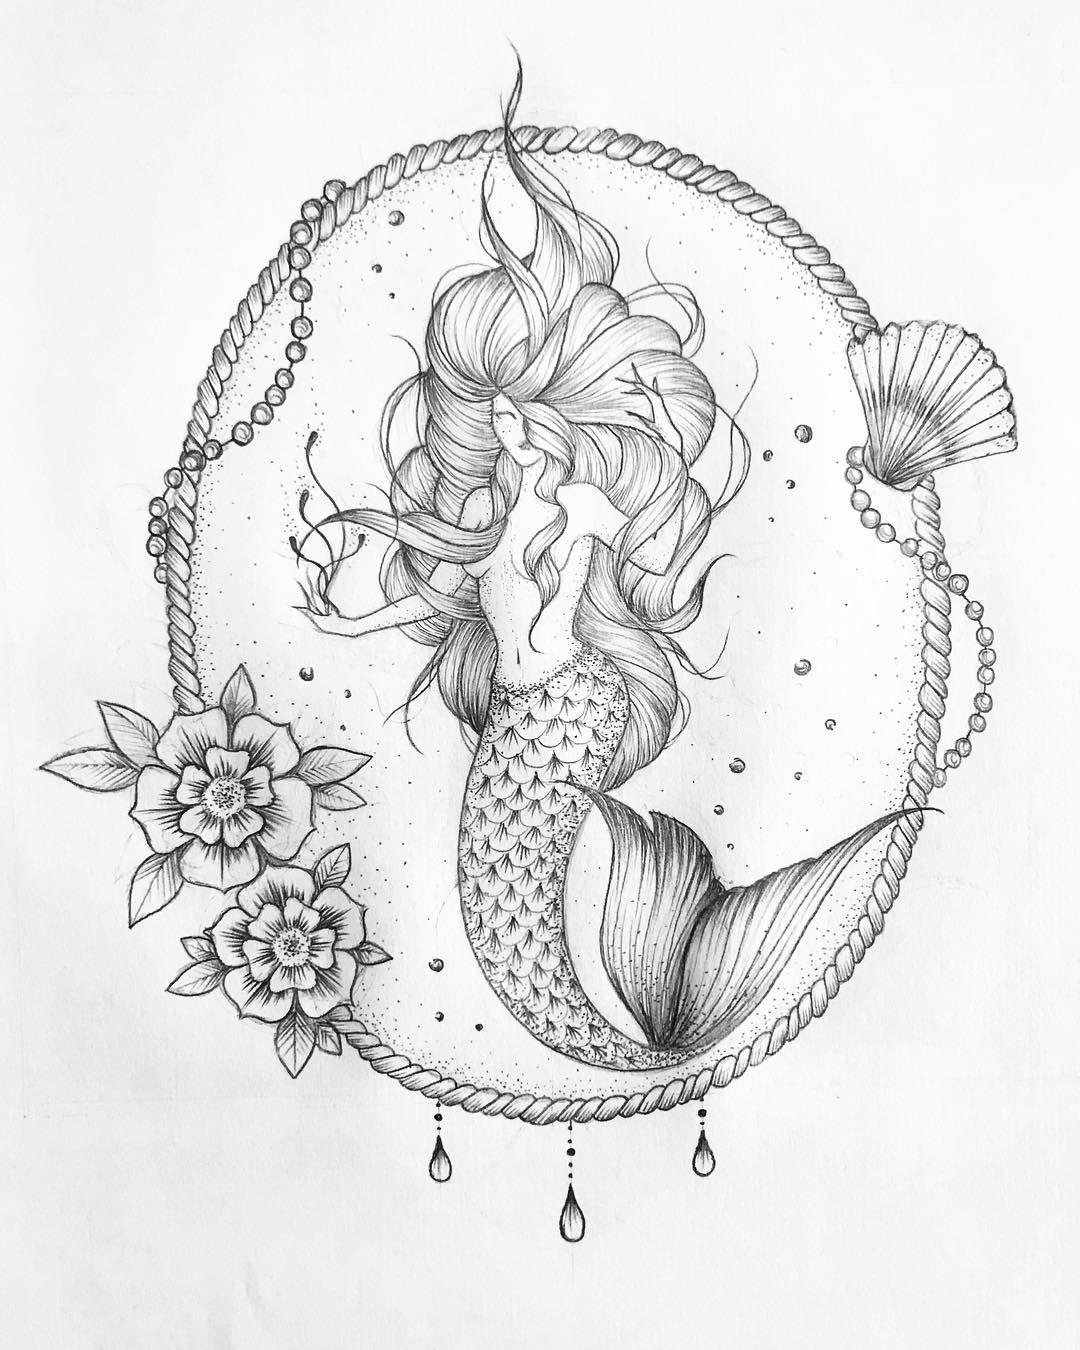 Pin By Matita On русалки эскиз тату рисунки тату